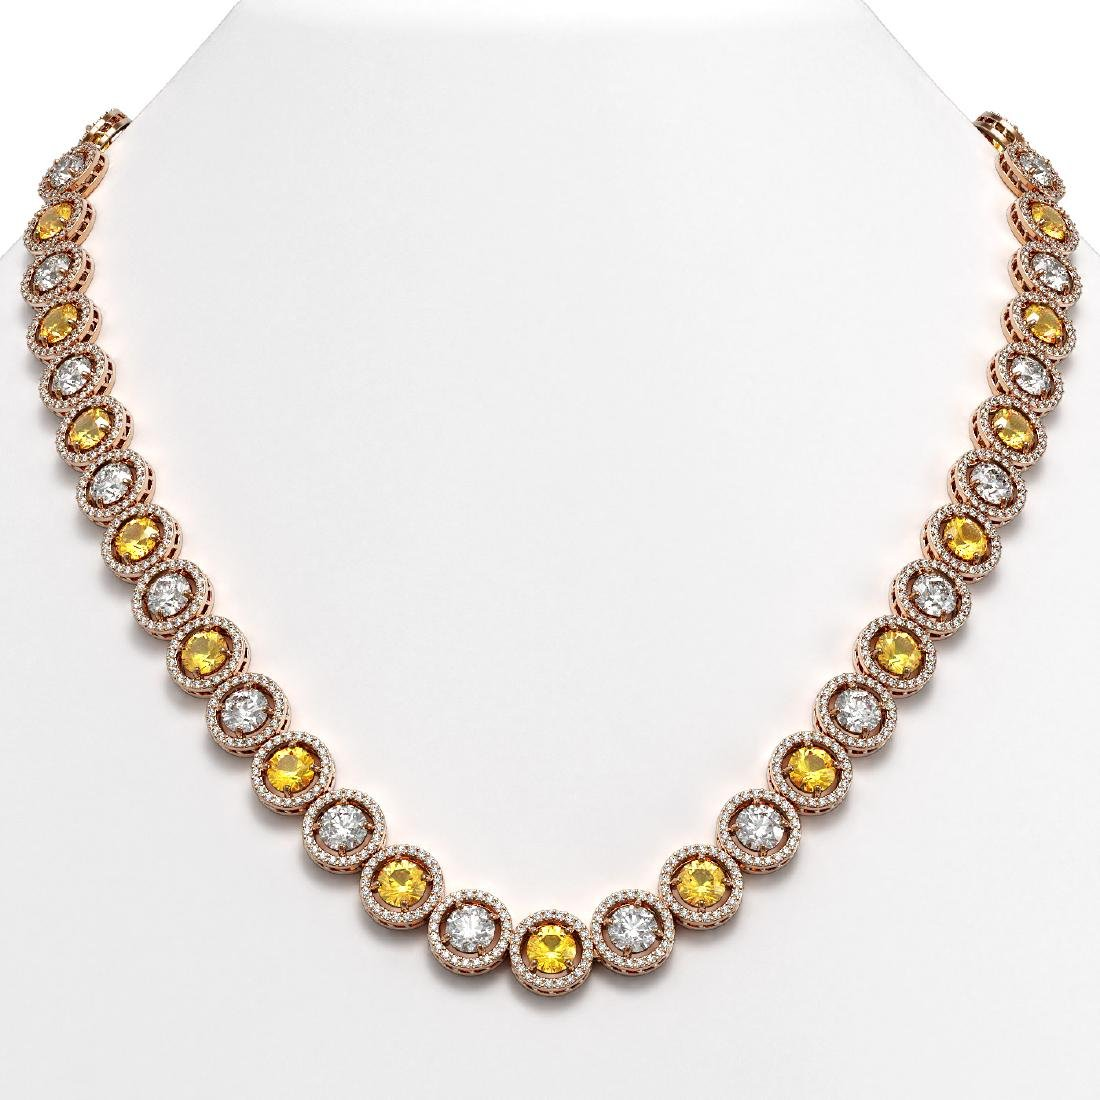 31.64 CTW Canary Yellow & White Diamond Designer